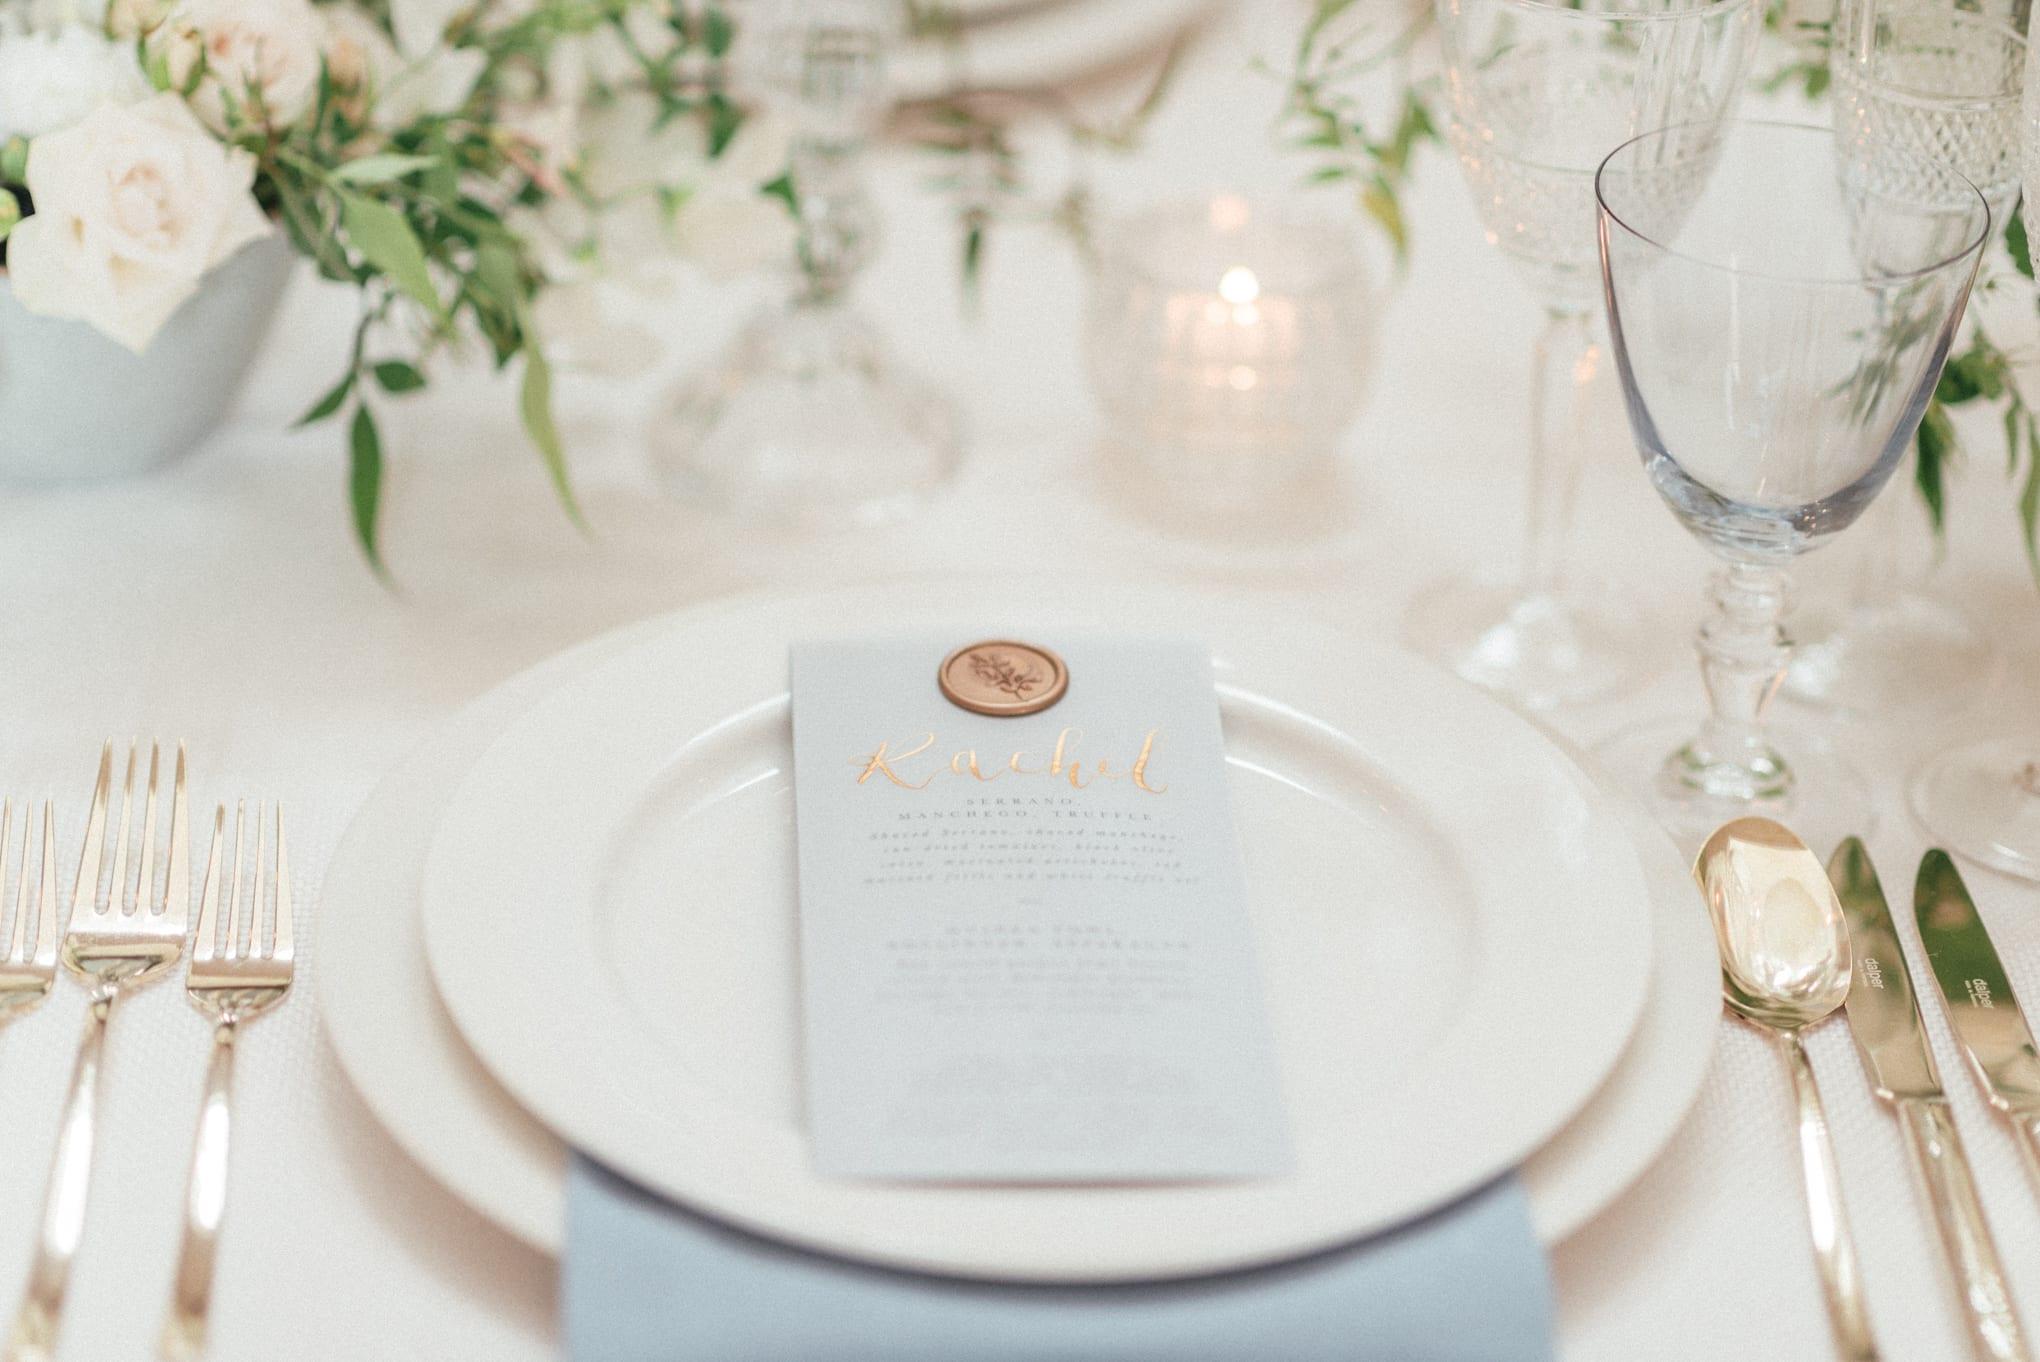 Powder blue place setting at a wedding